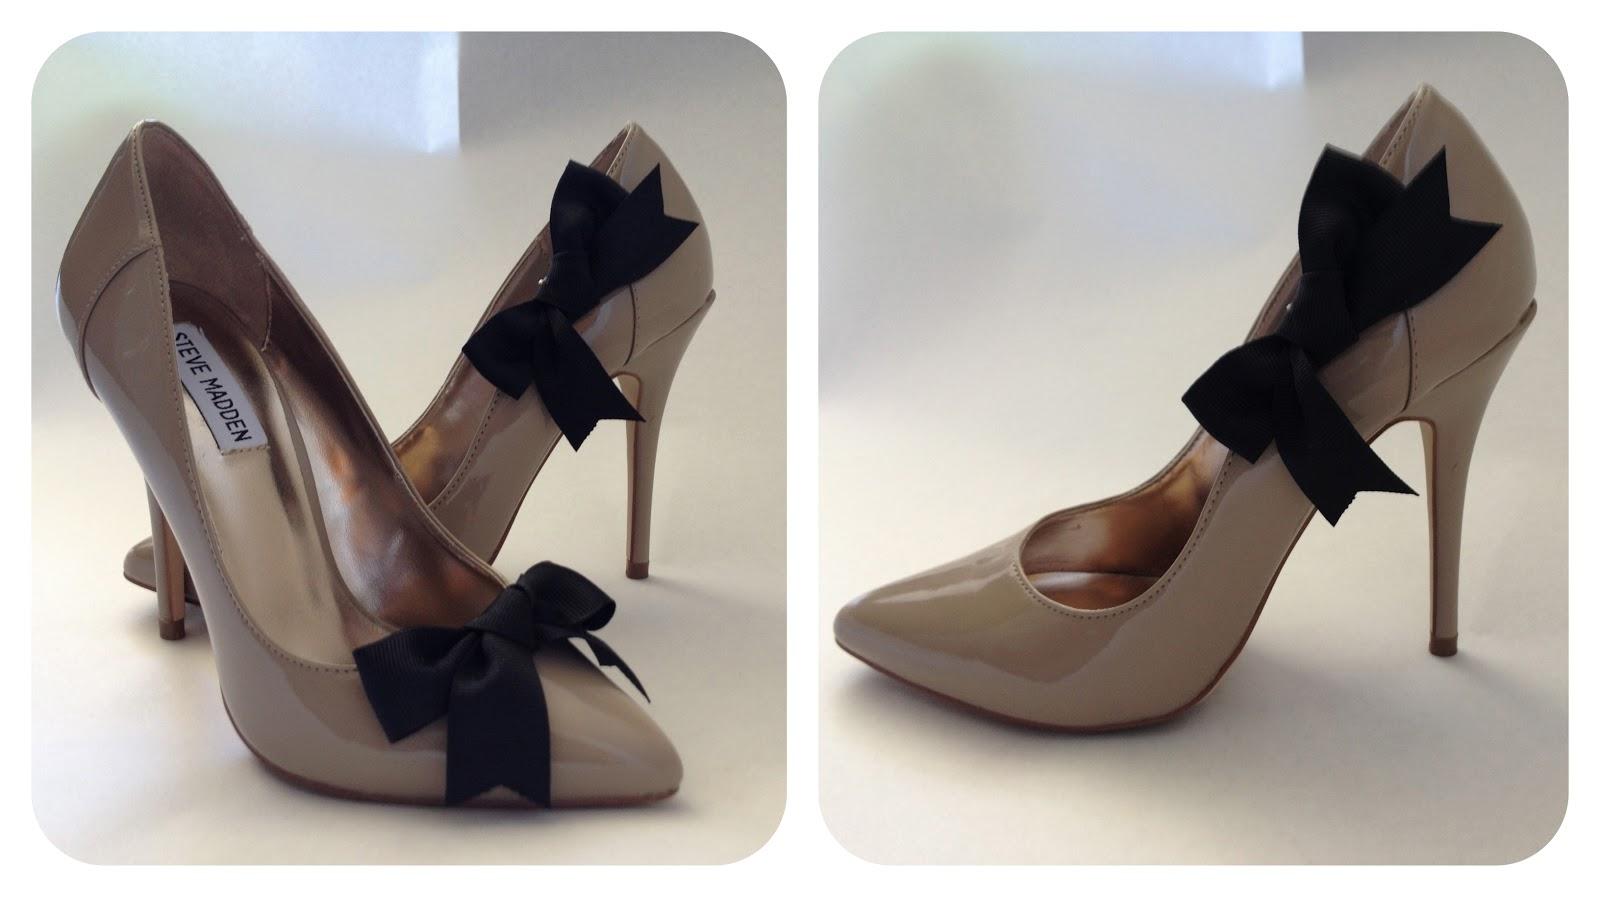 a1f82785353 DIY Tutorial: Christian Louboutin Bow-Tie Shoe |Fashion, Lifestyle ...